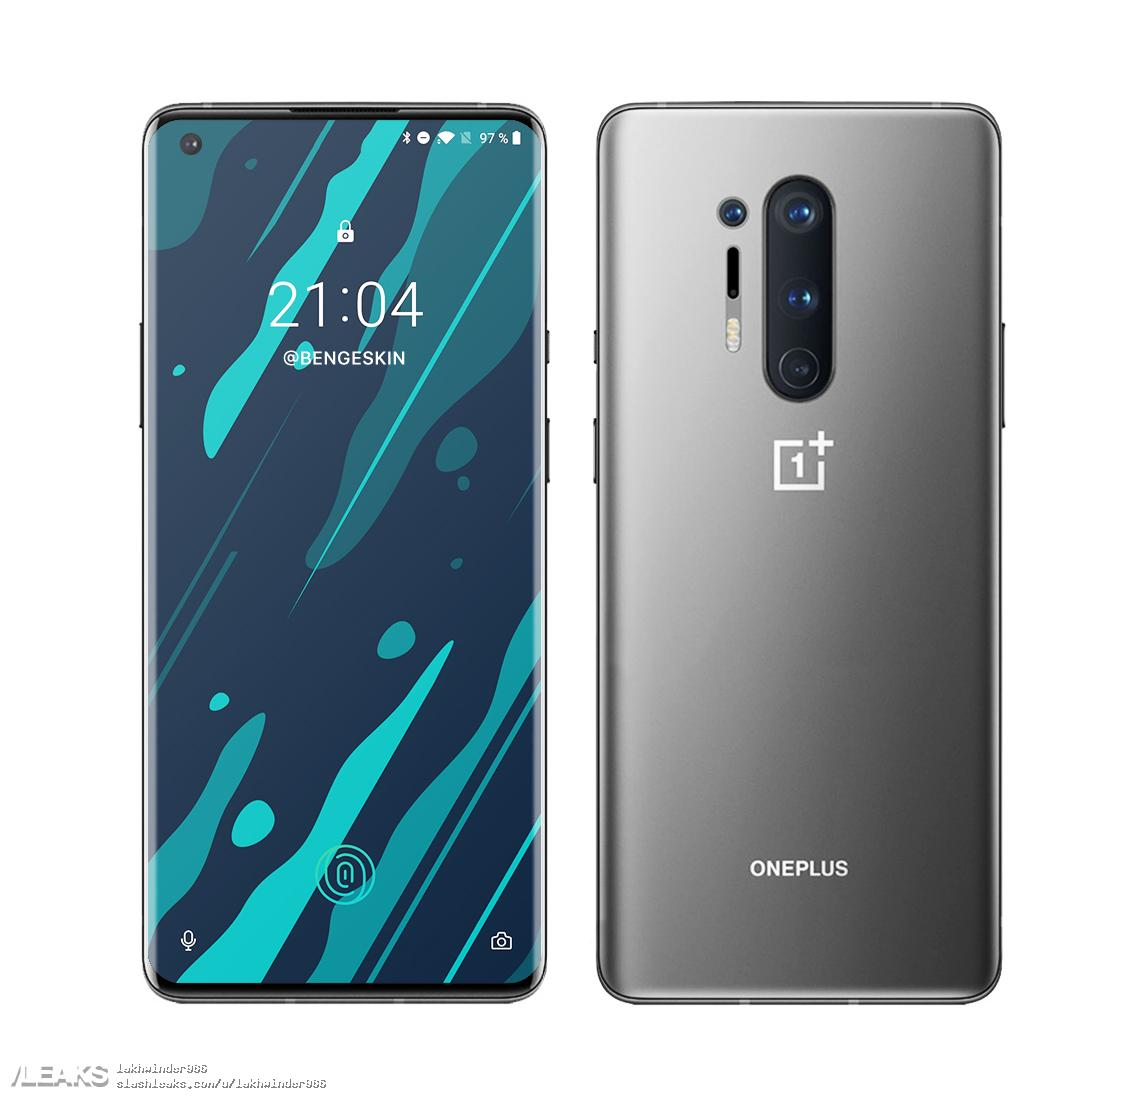 Oneplus 8 E 8 Pro O Que Sabemos Ate Agora Sobre Os Smartphones Tecmundo